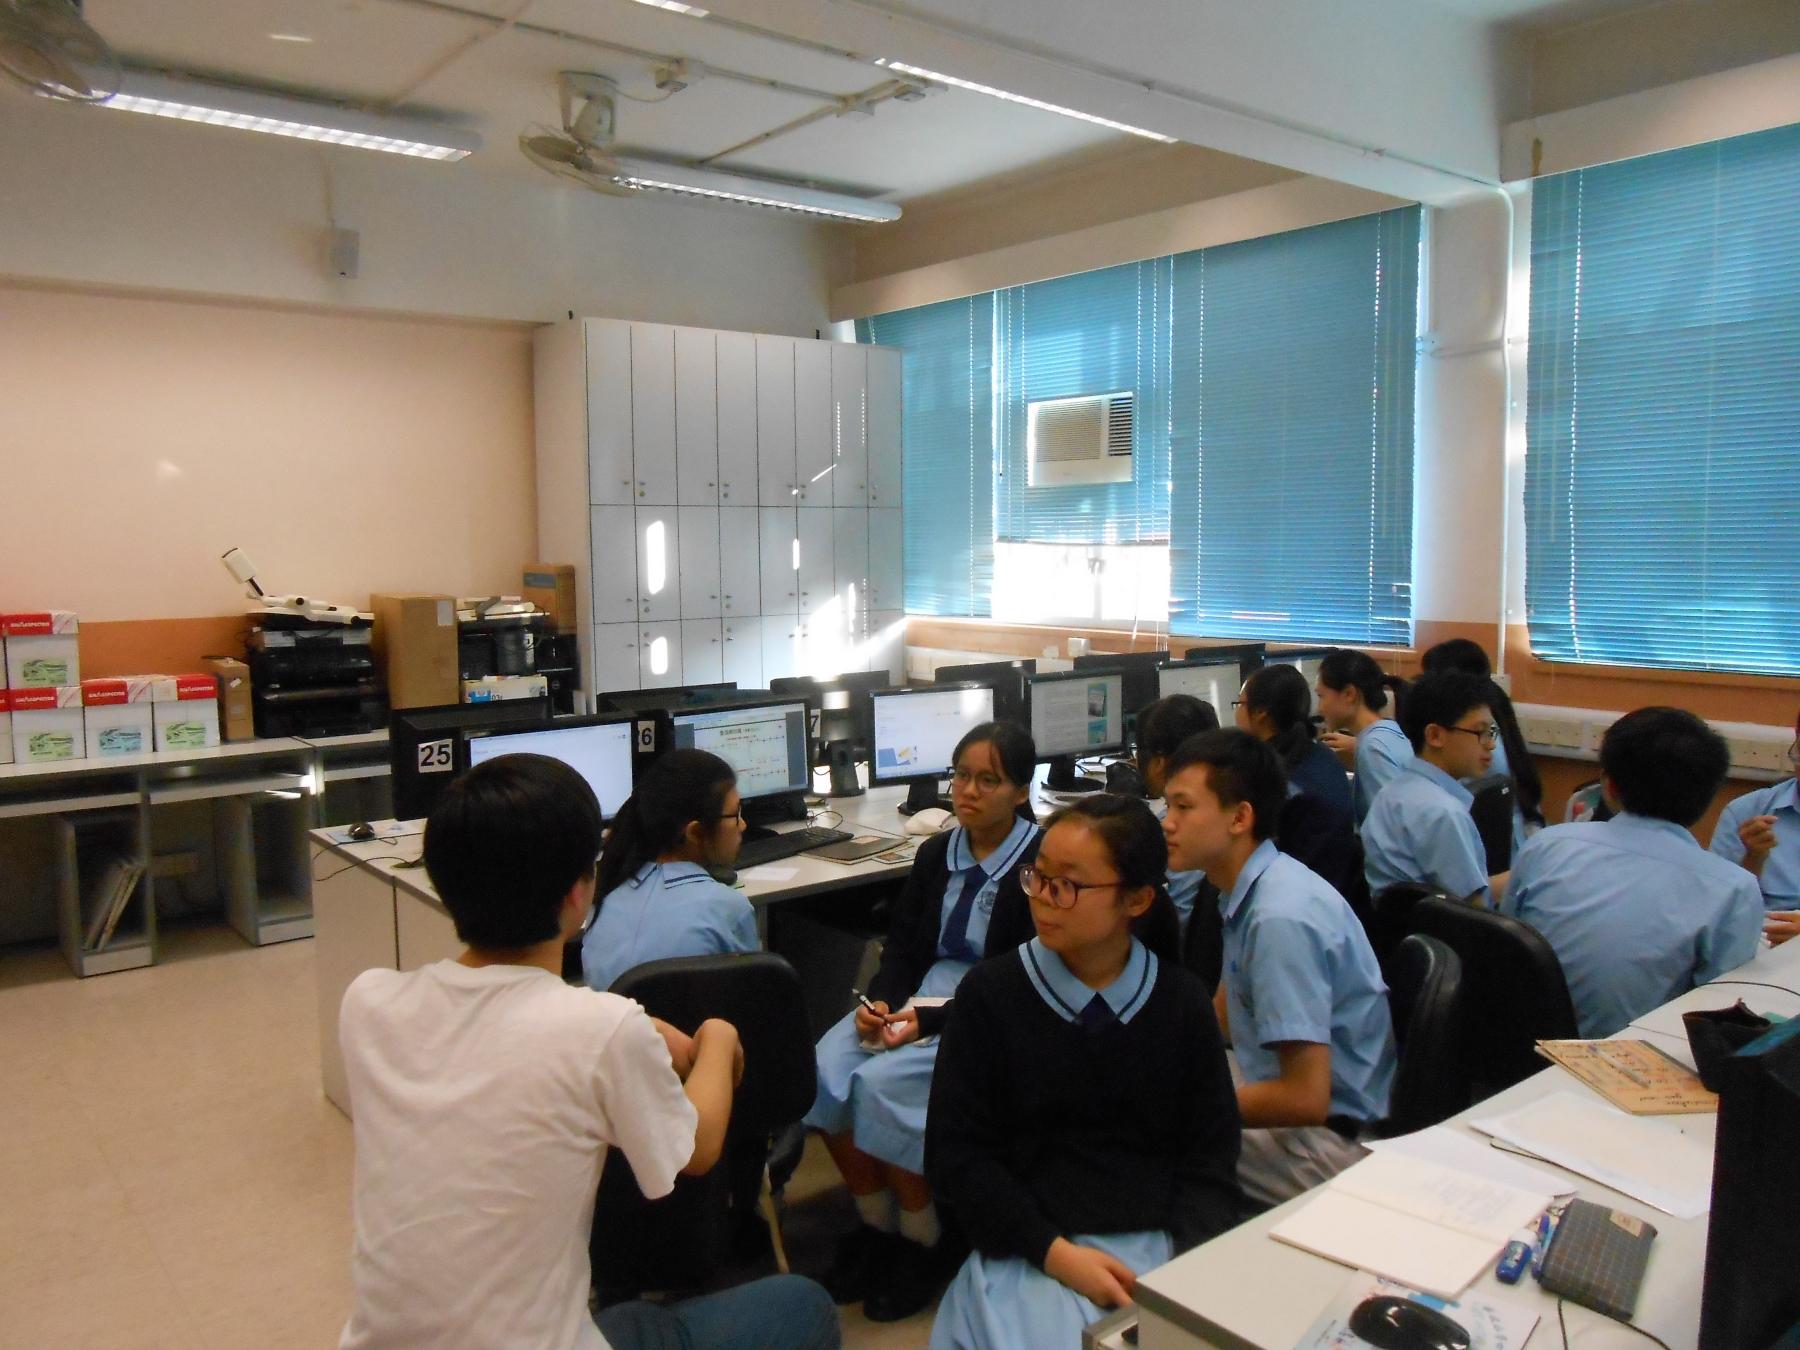 http://www.npc.edu.hk/sites/default/files/dscn0992.jpg